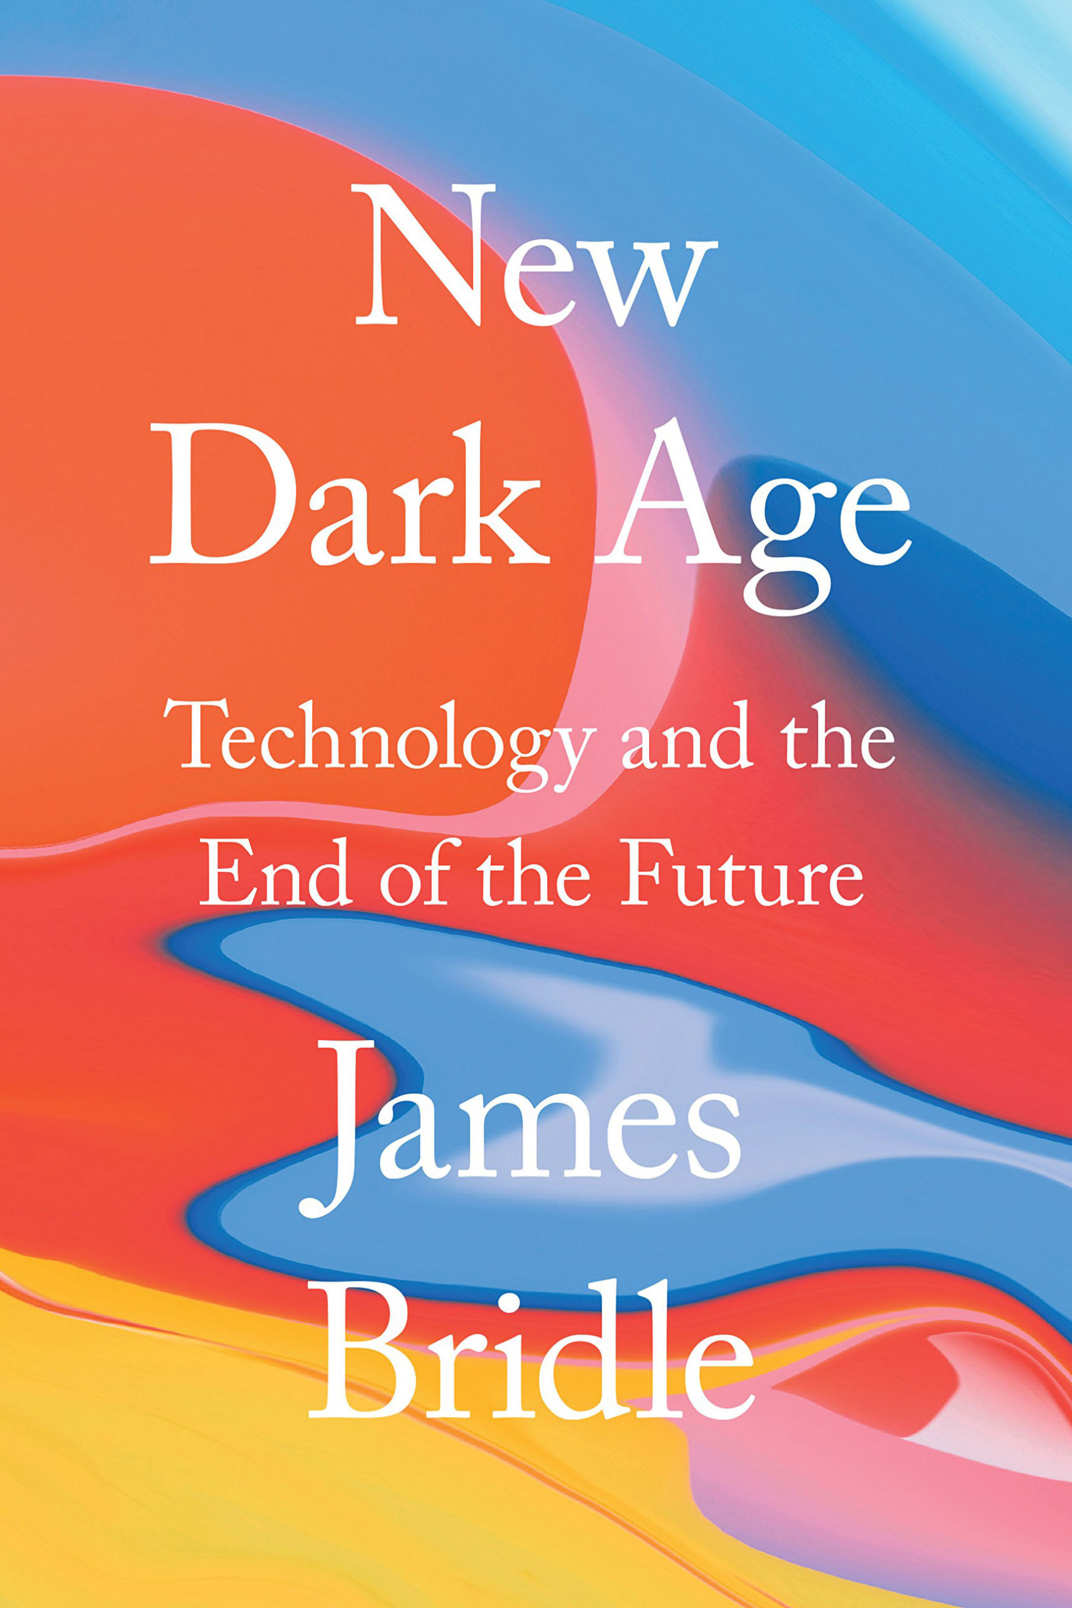 <em>New Dark Age</em> by James Bridle